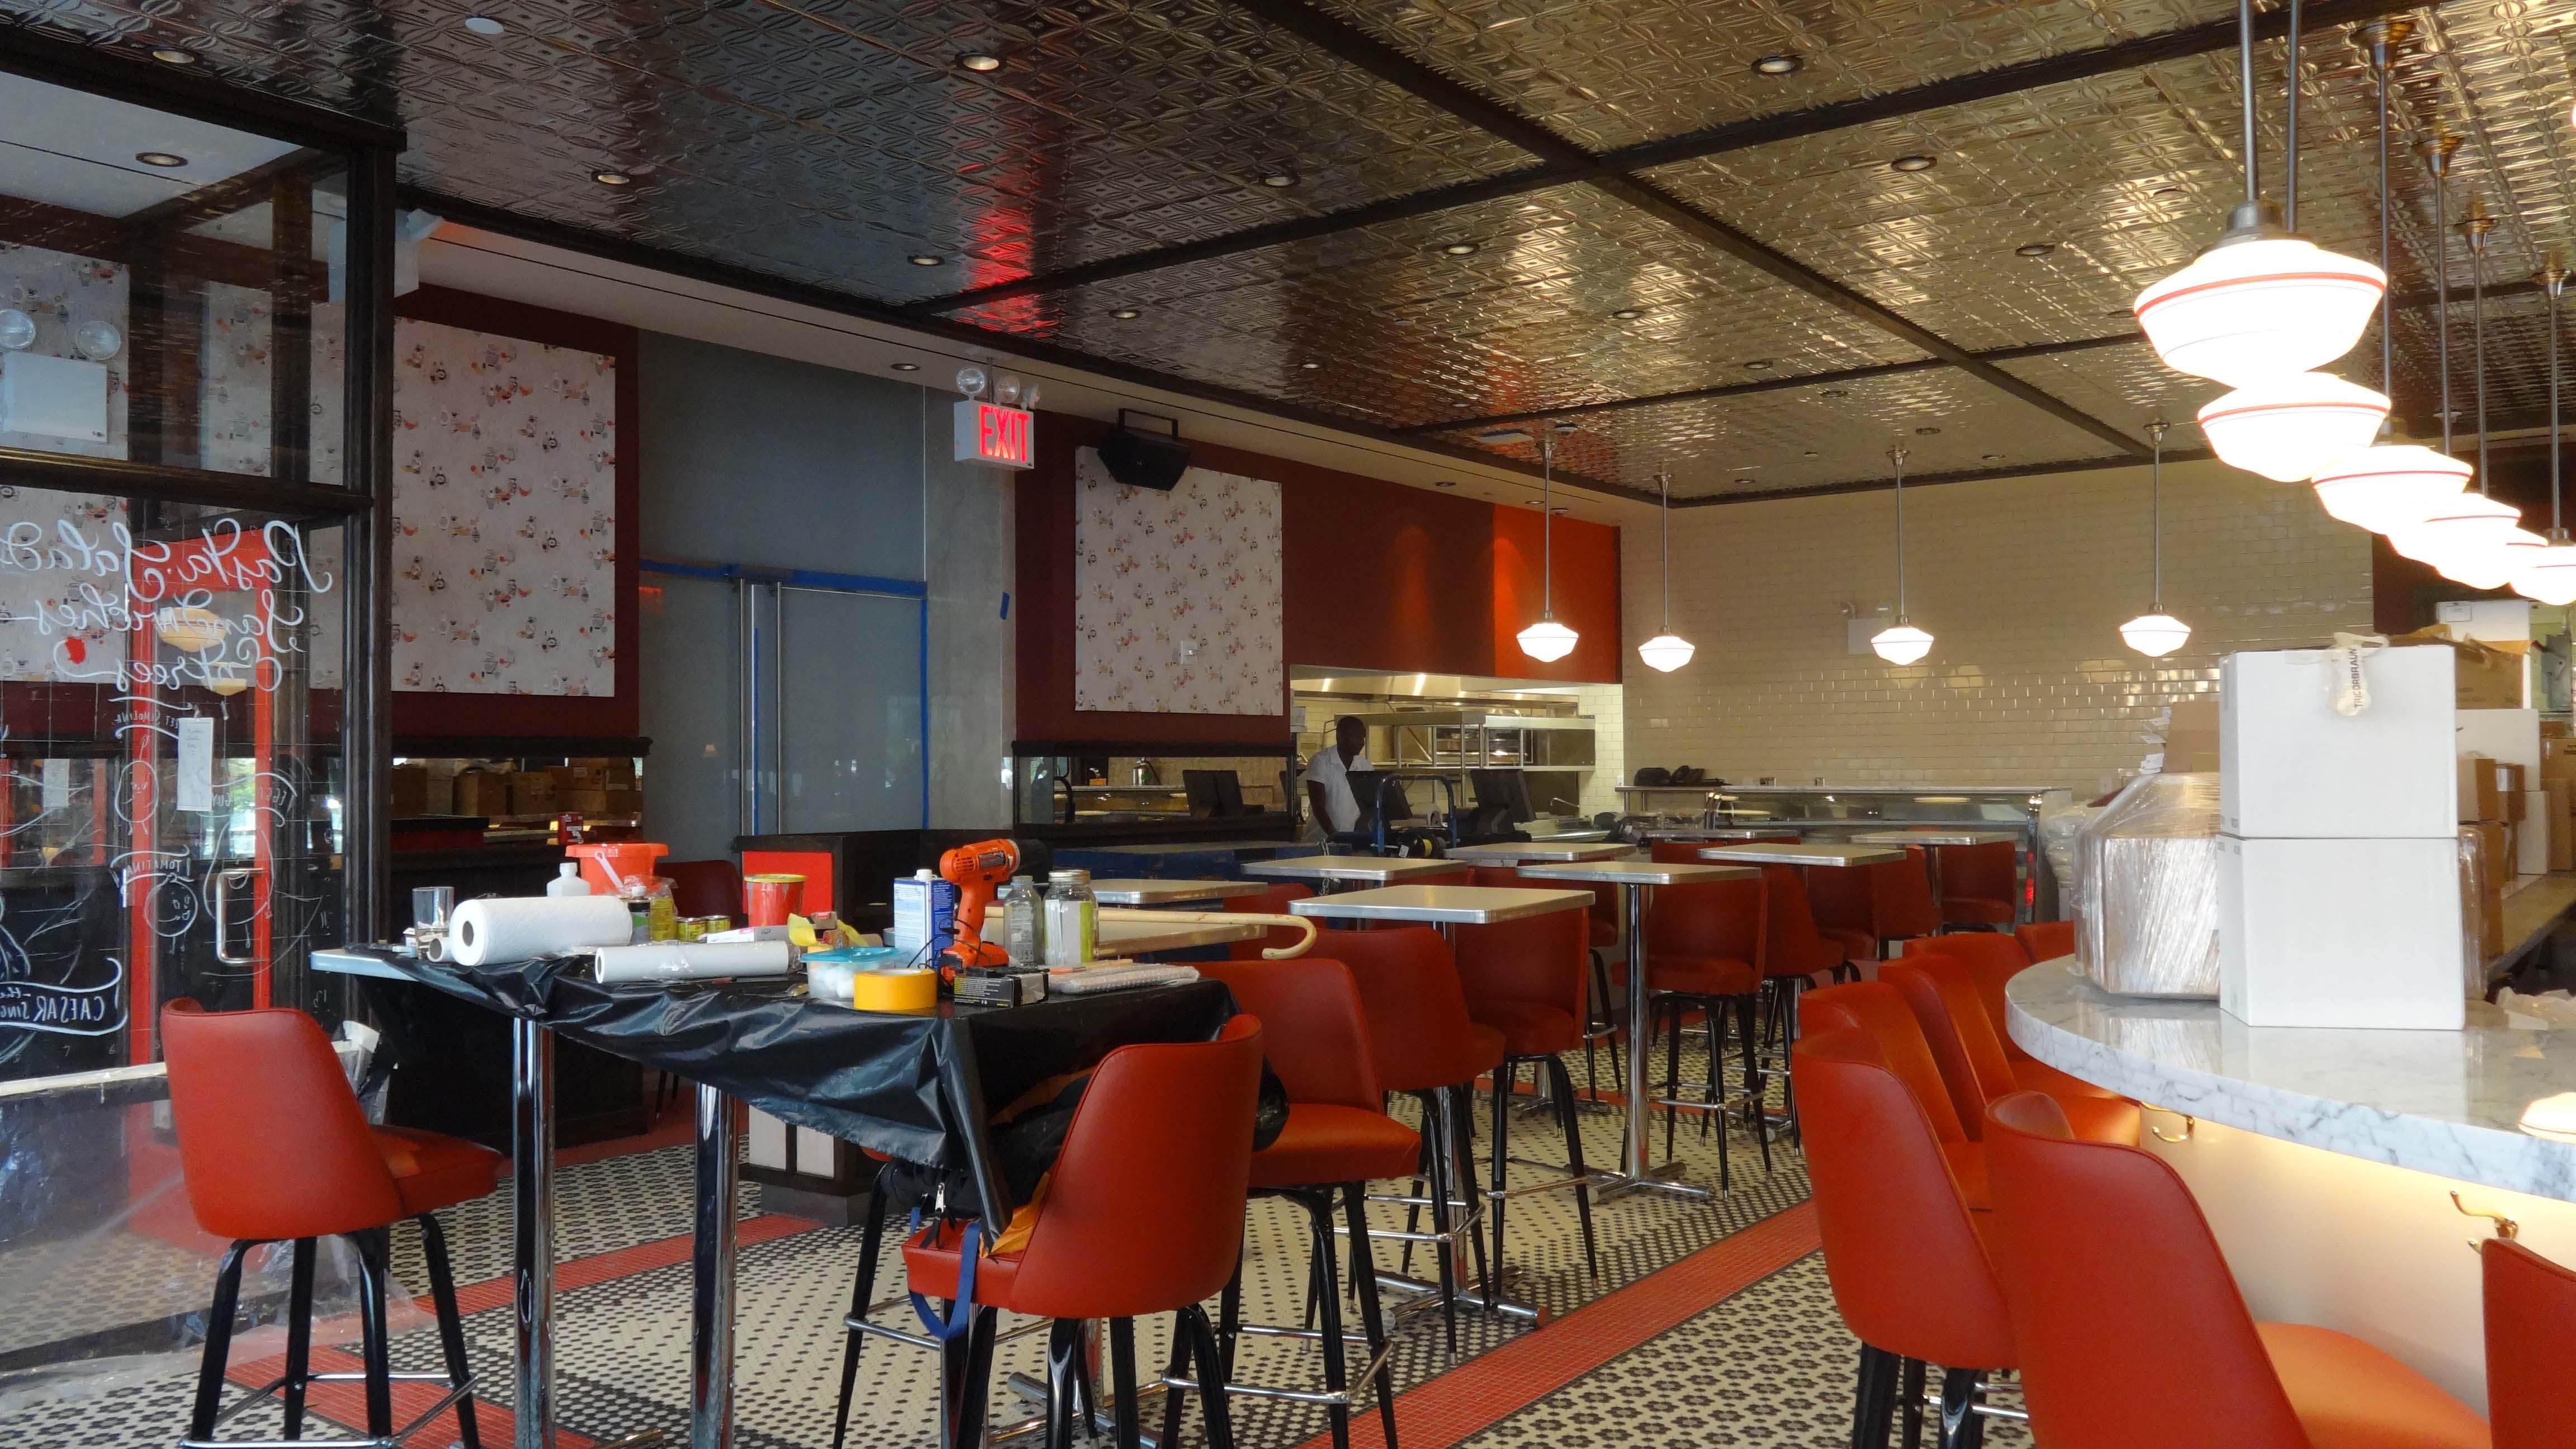 Parm dining room 6-10-2015